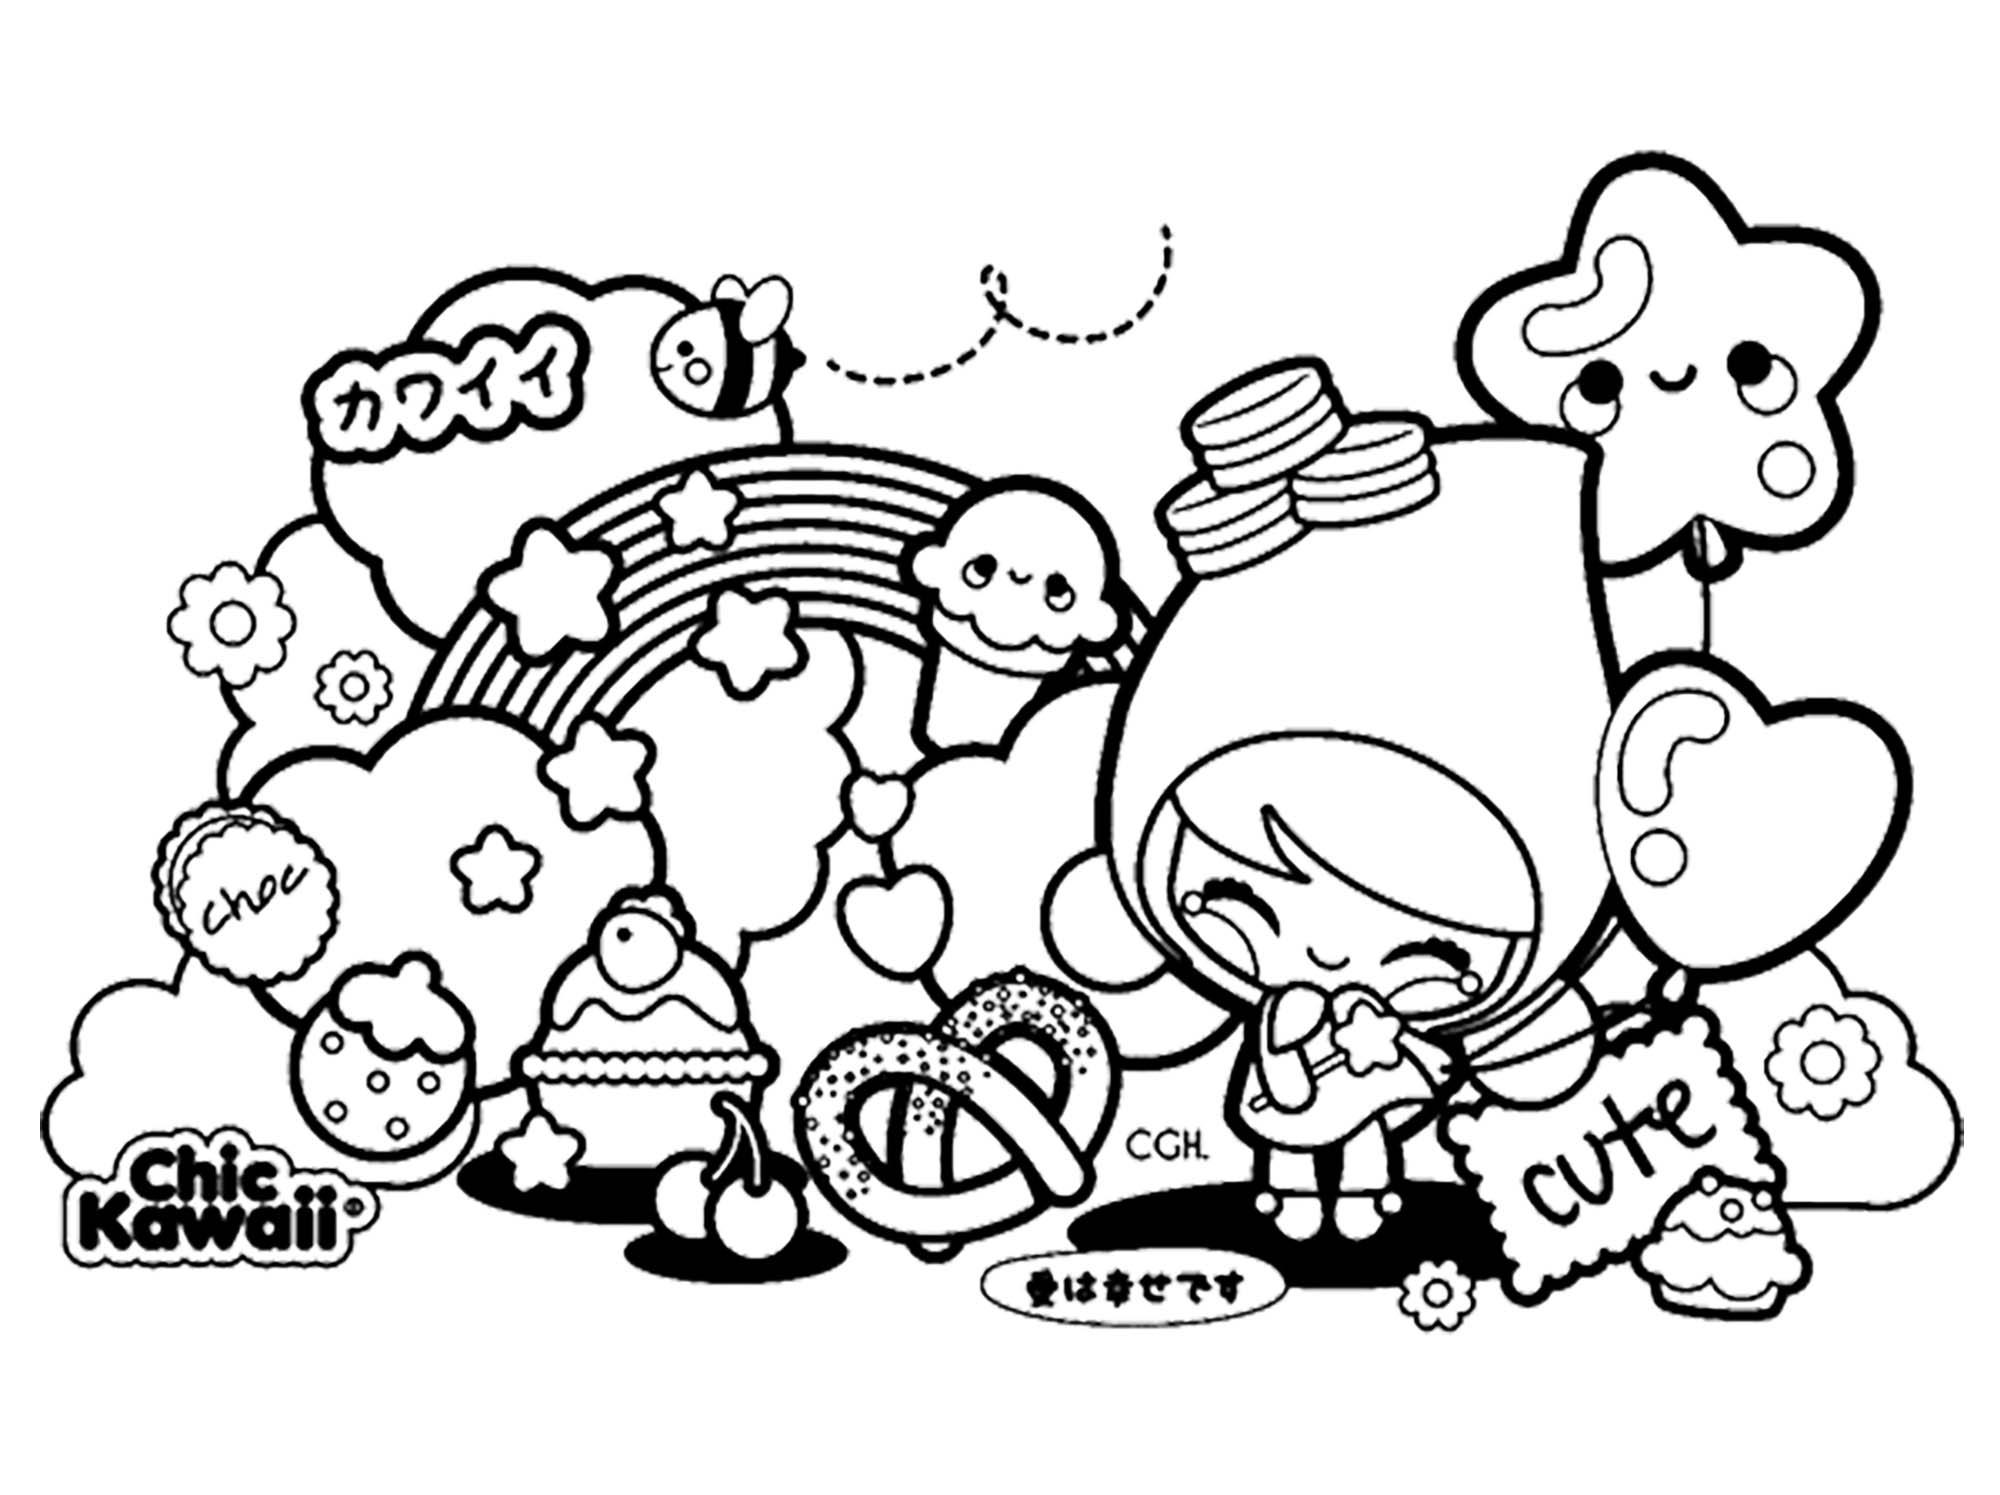 Mangas 7631 Mangas Disegni Da Colorare Per Adulti